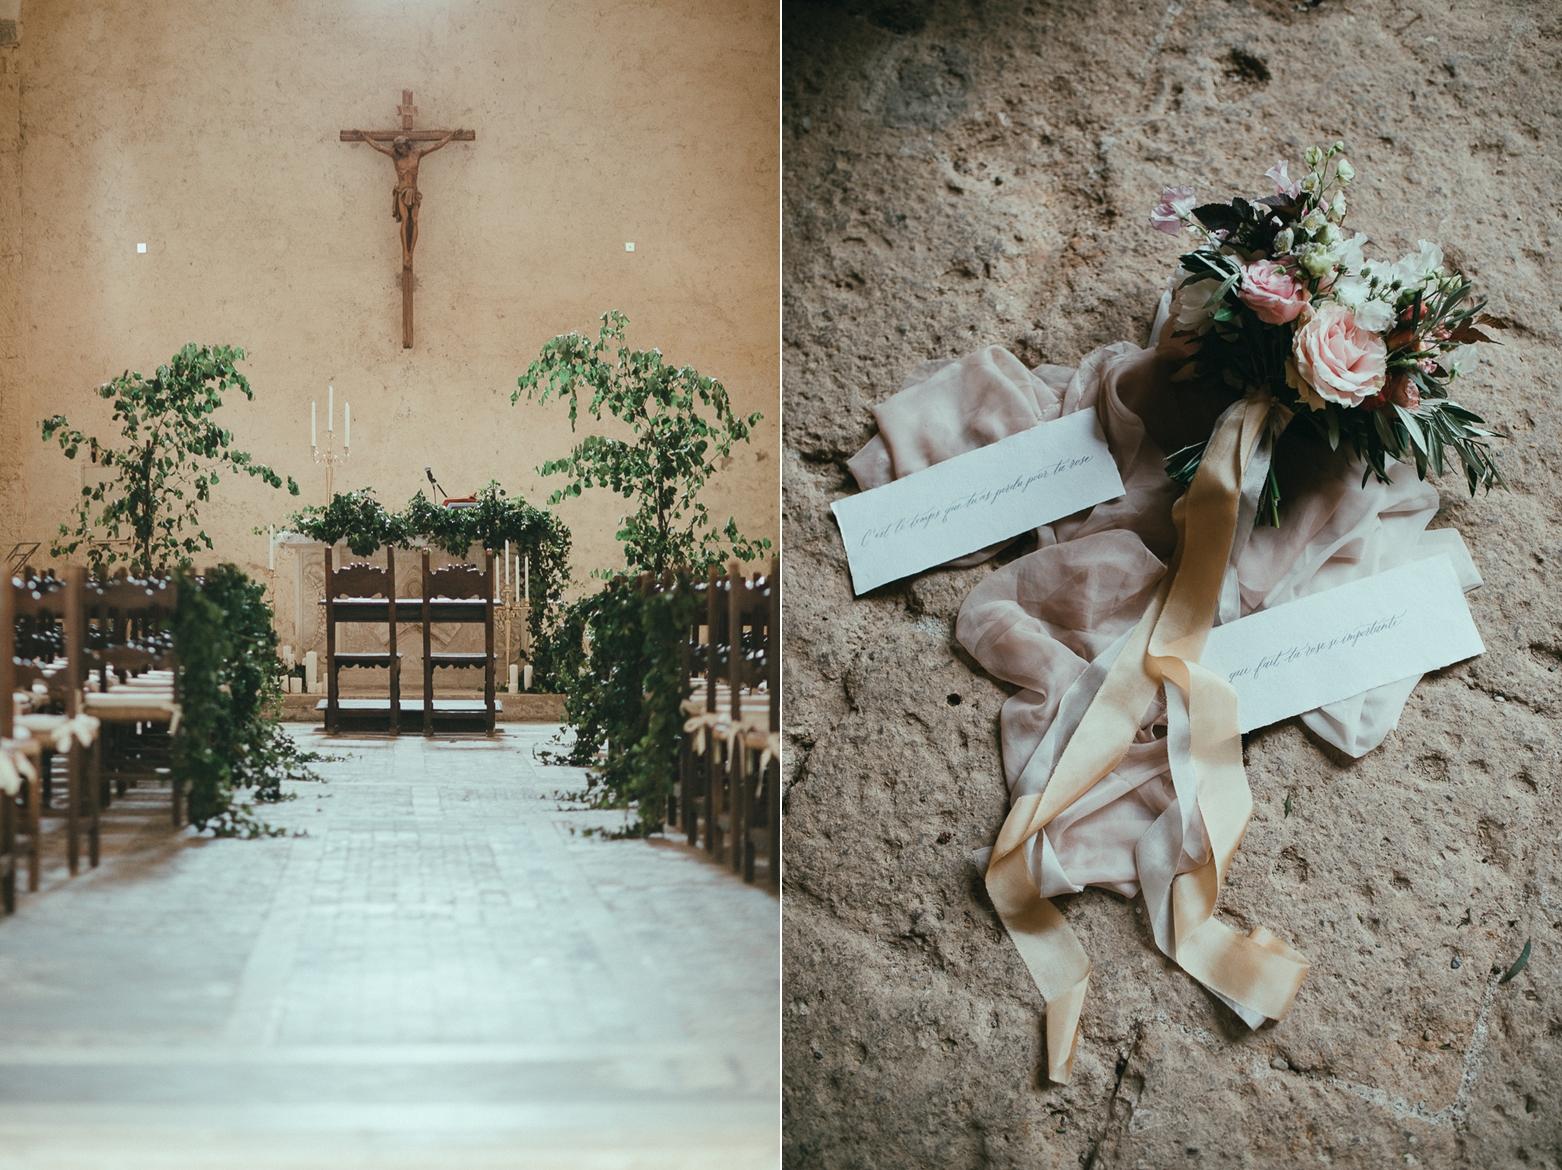 badia-orvieto-wedding-photographer (49).jpg